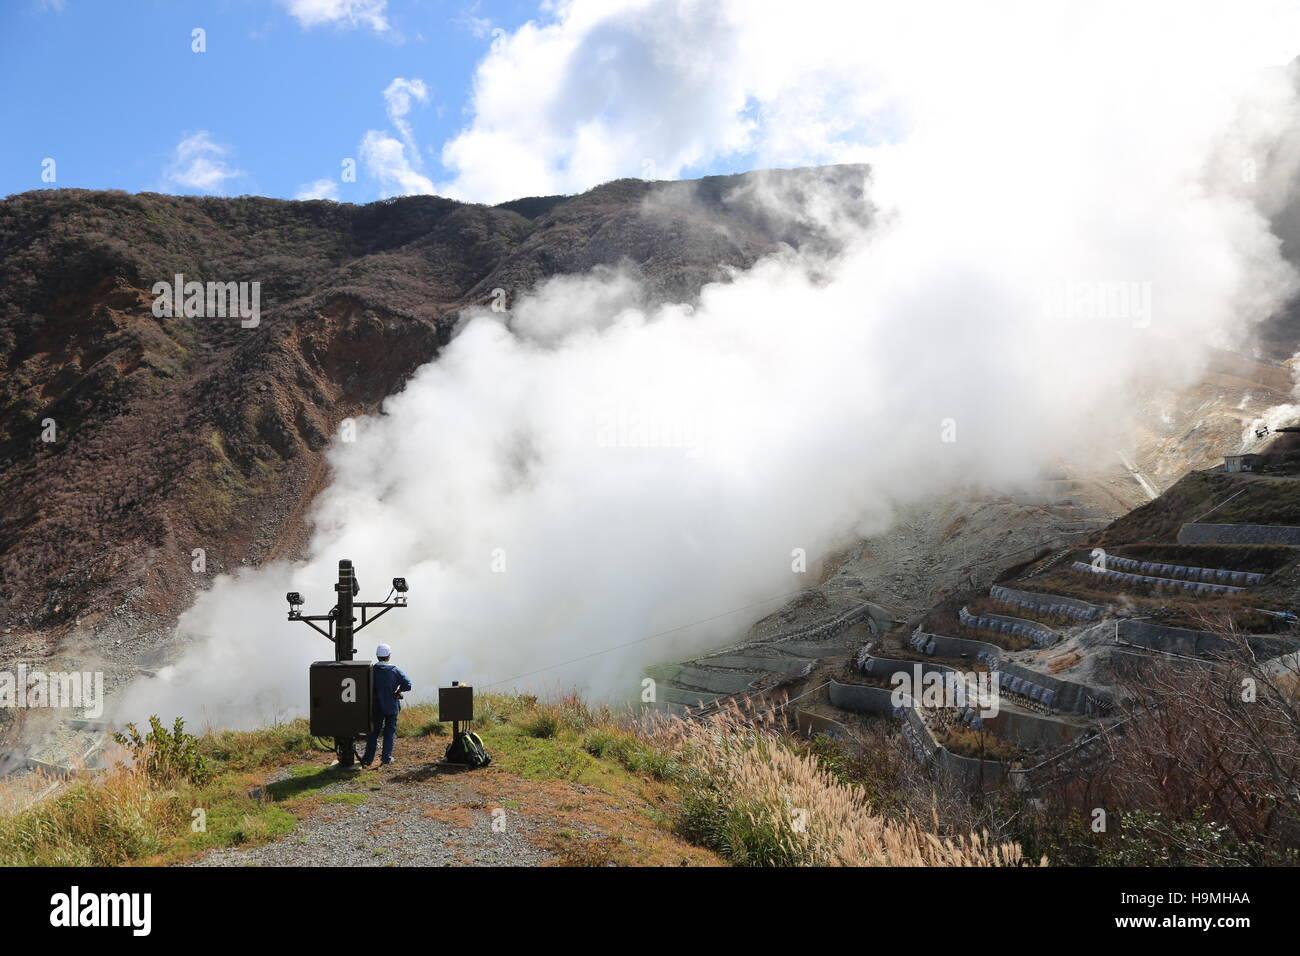 Volcanic in Hakone Tokyo Japan - Stock Image